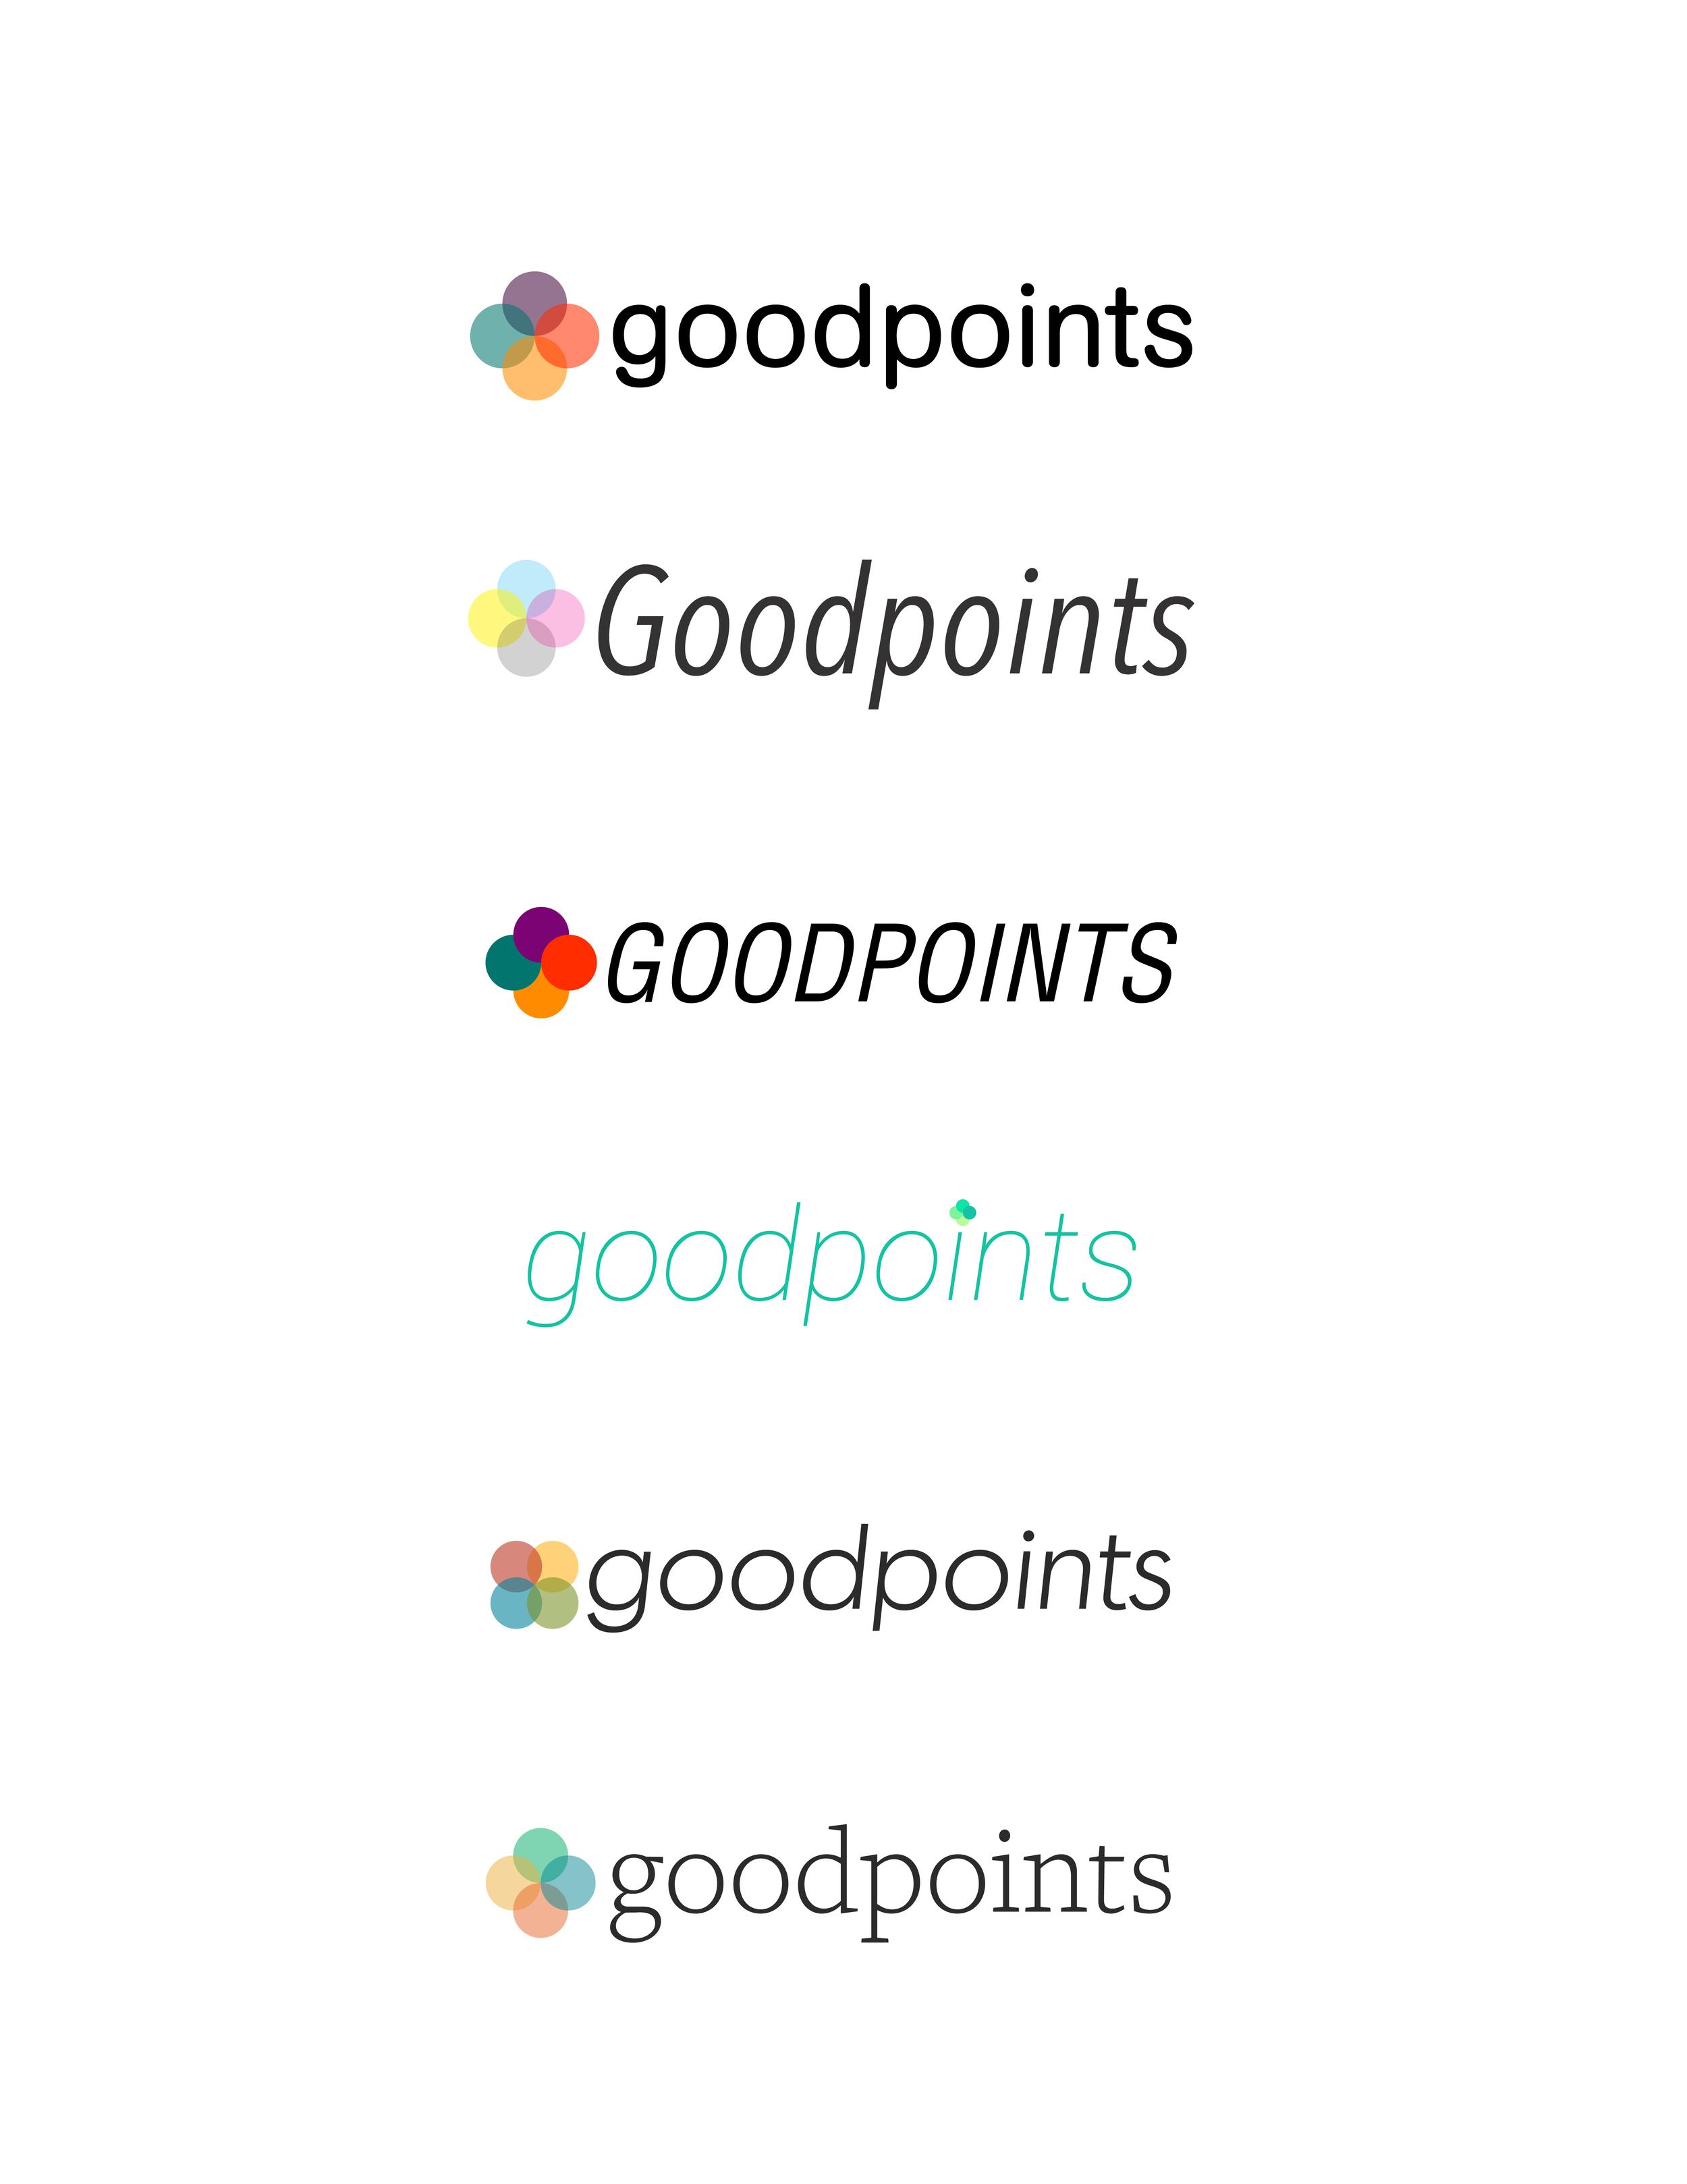 goodpoints_branding-01.png